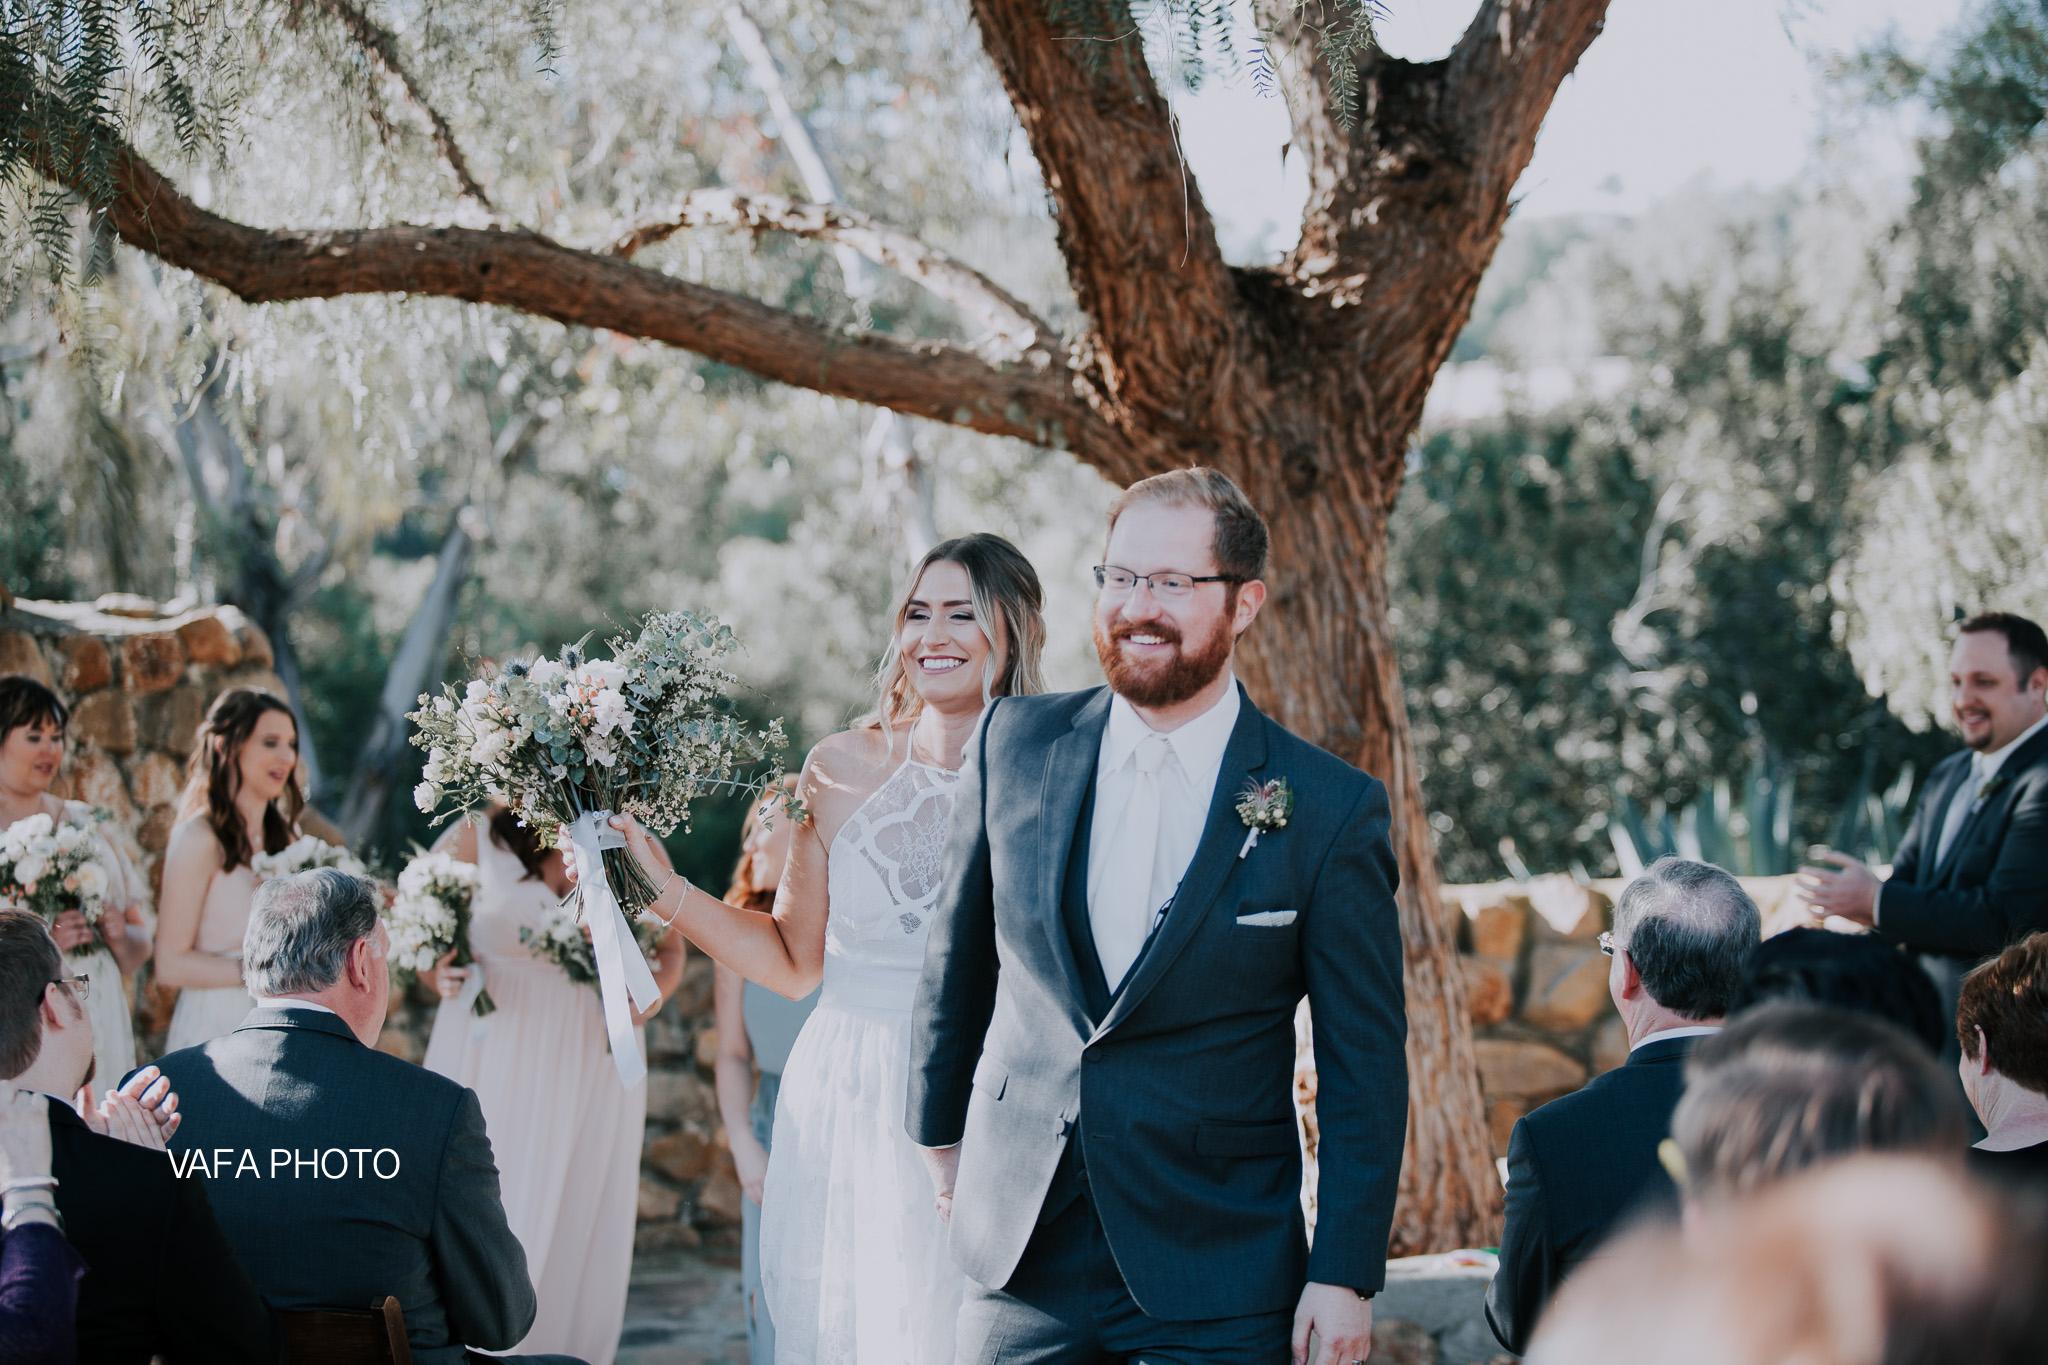 Leo-Carrillo-Ranch-Wedding-Lauren-Mike-Vafa-Photo-652.jpg